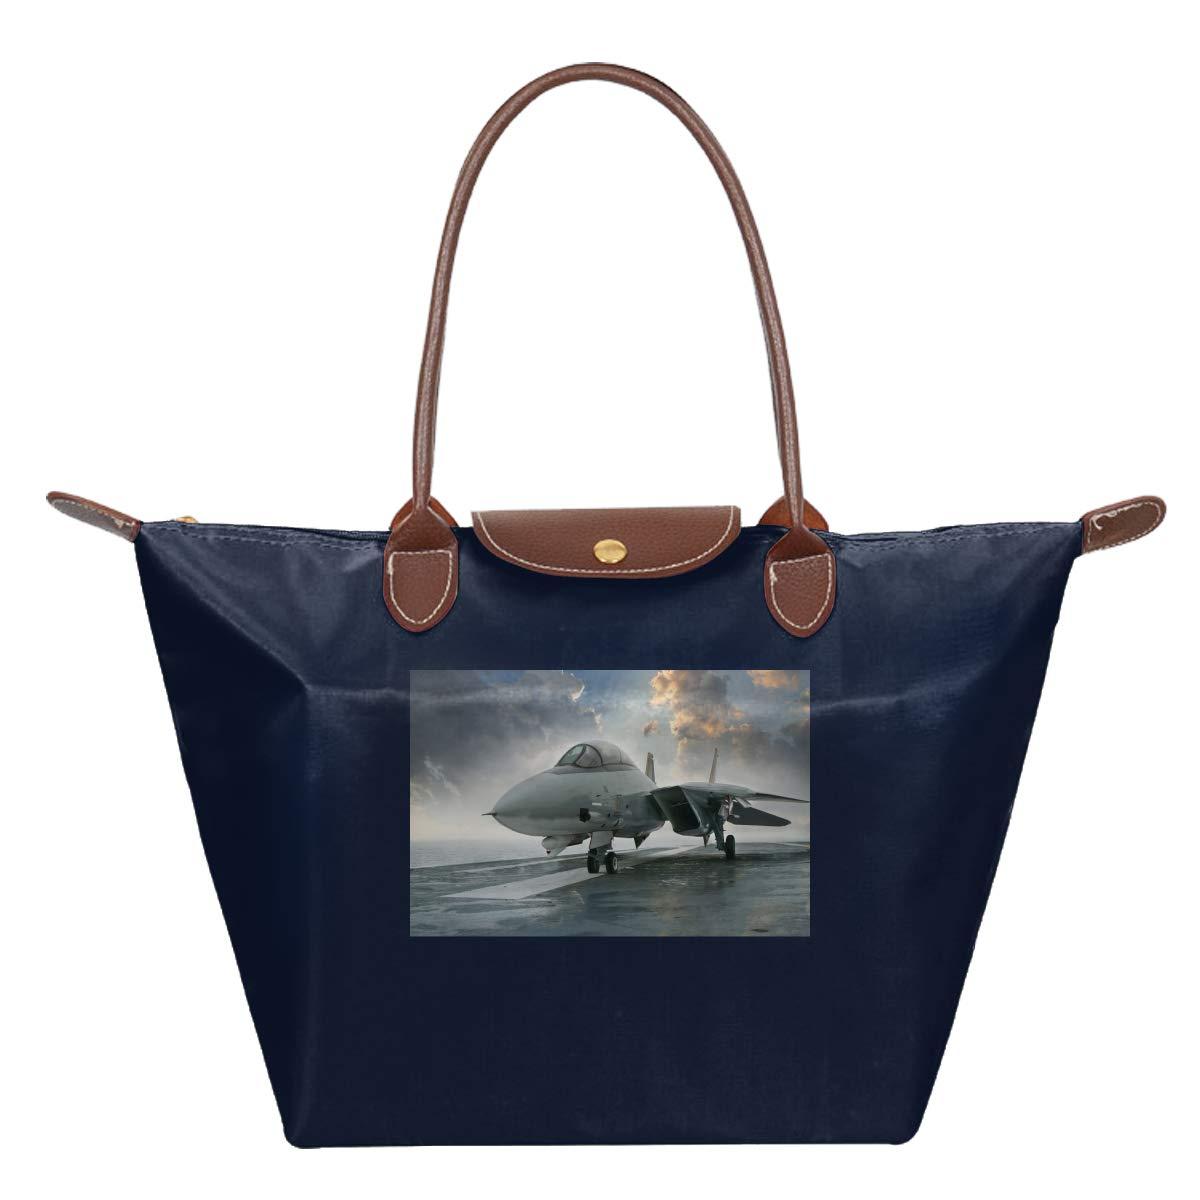 F-14 F14 Tomcat Jet Fighter Aircraft Plane Gift Waterproof Leather Folded Messenger Nylon Bag Travel Tote Hopping Folding School Handbags